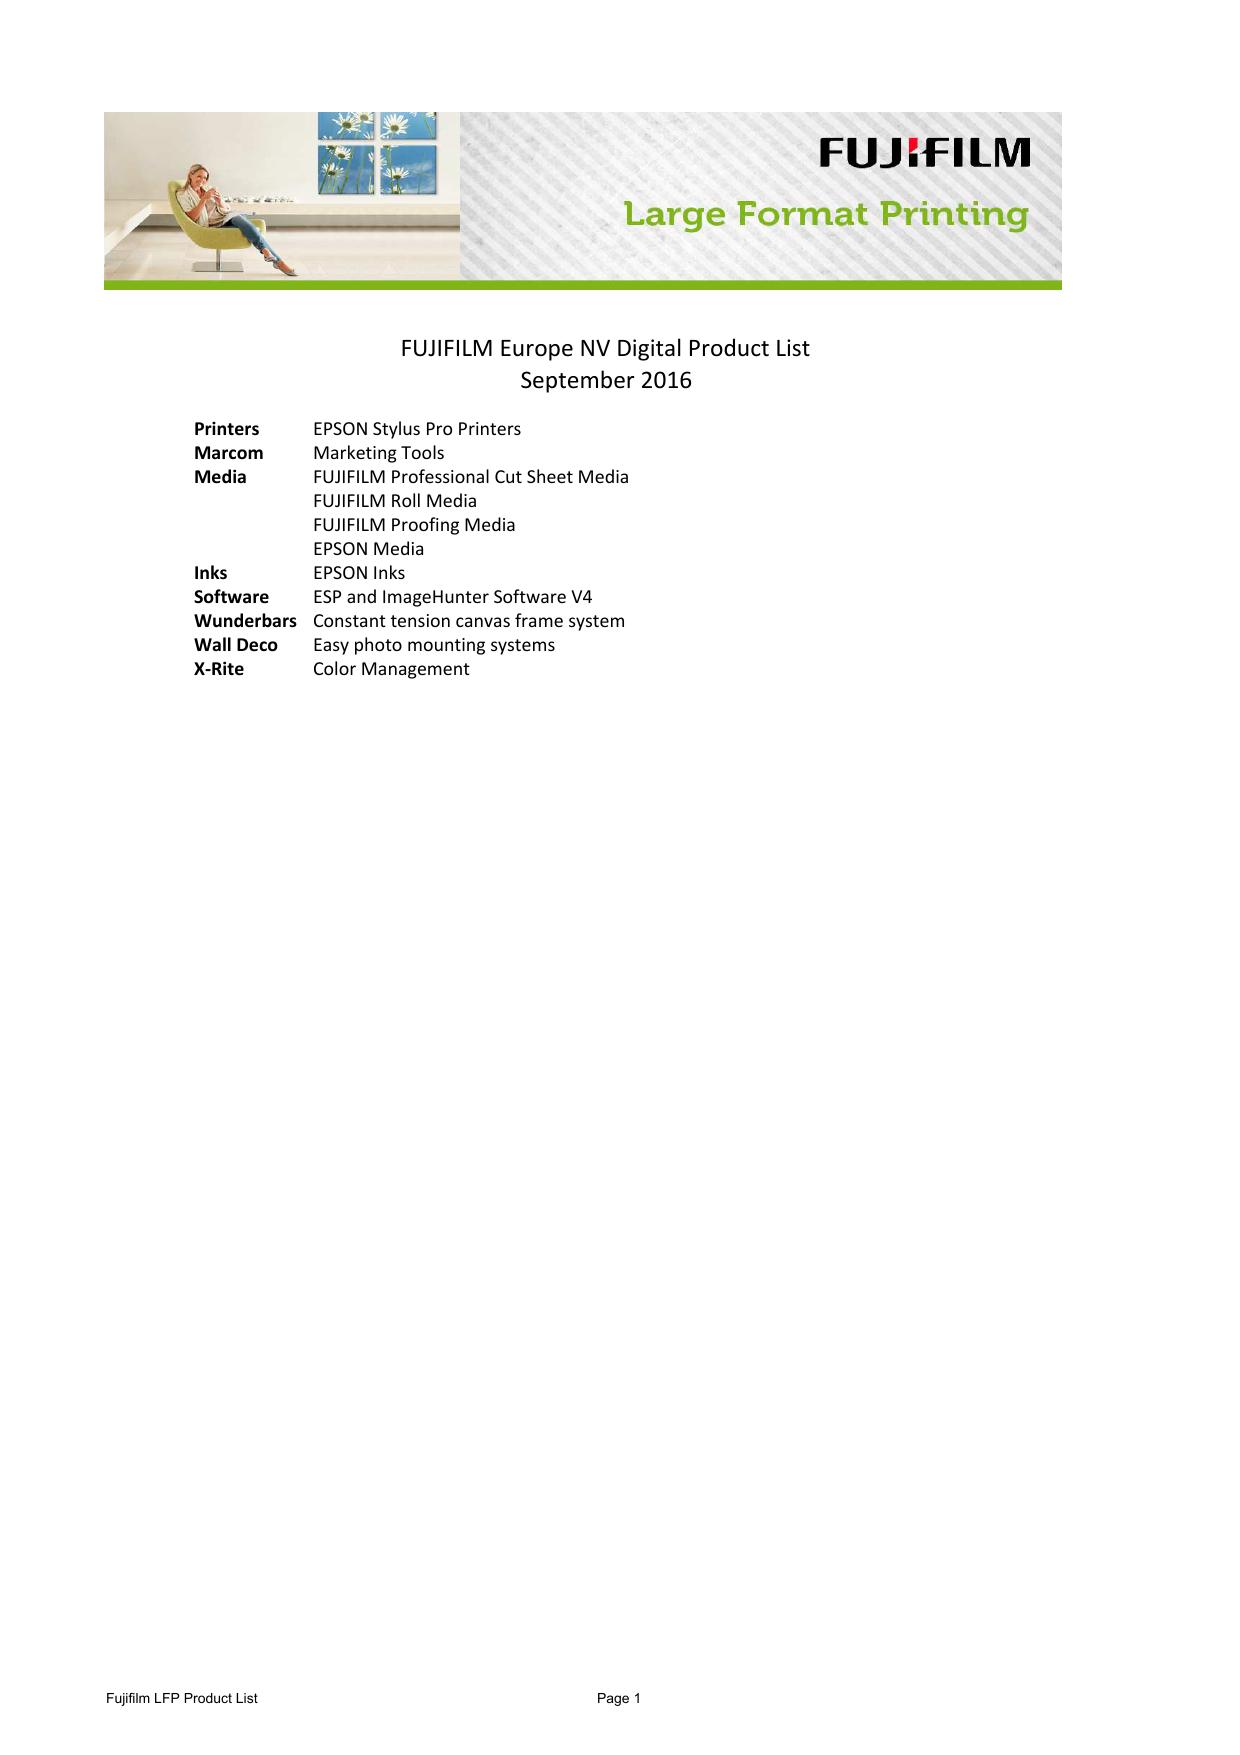 LFP Price List September 2016_FUJIFILM Hellas SA_92 xlsx